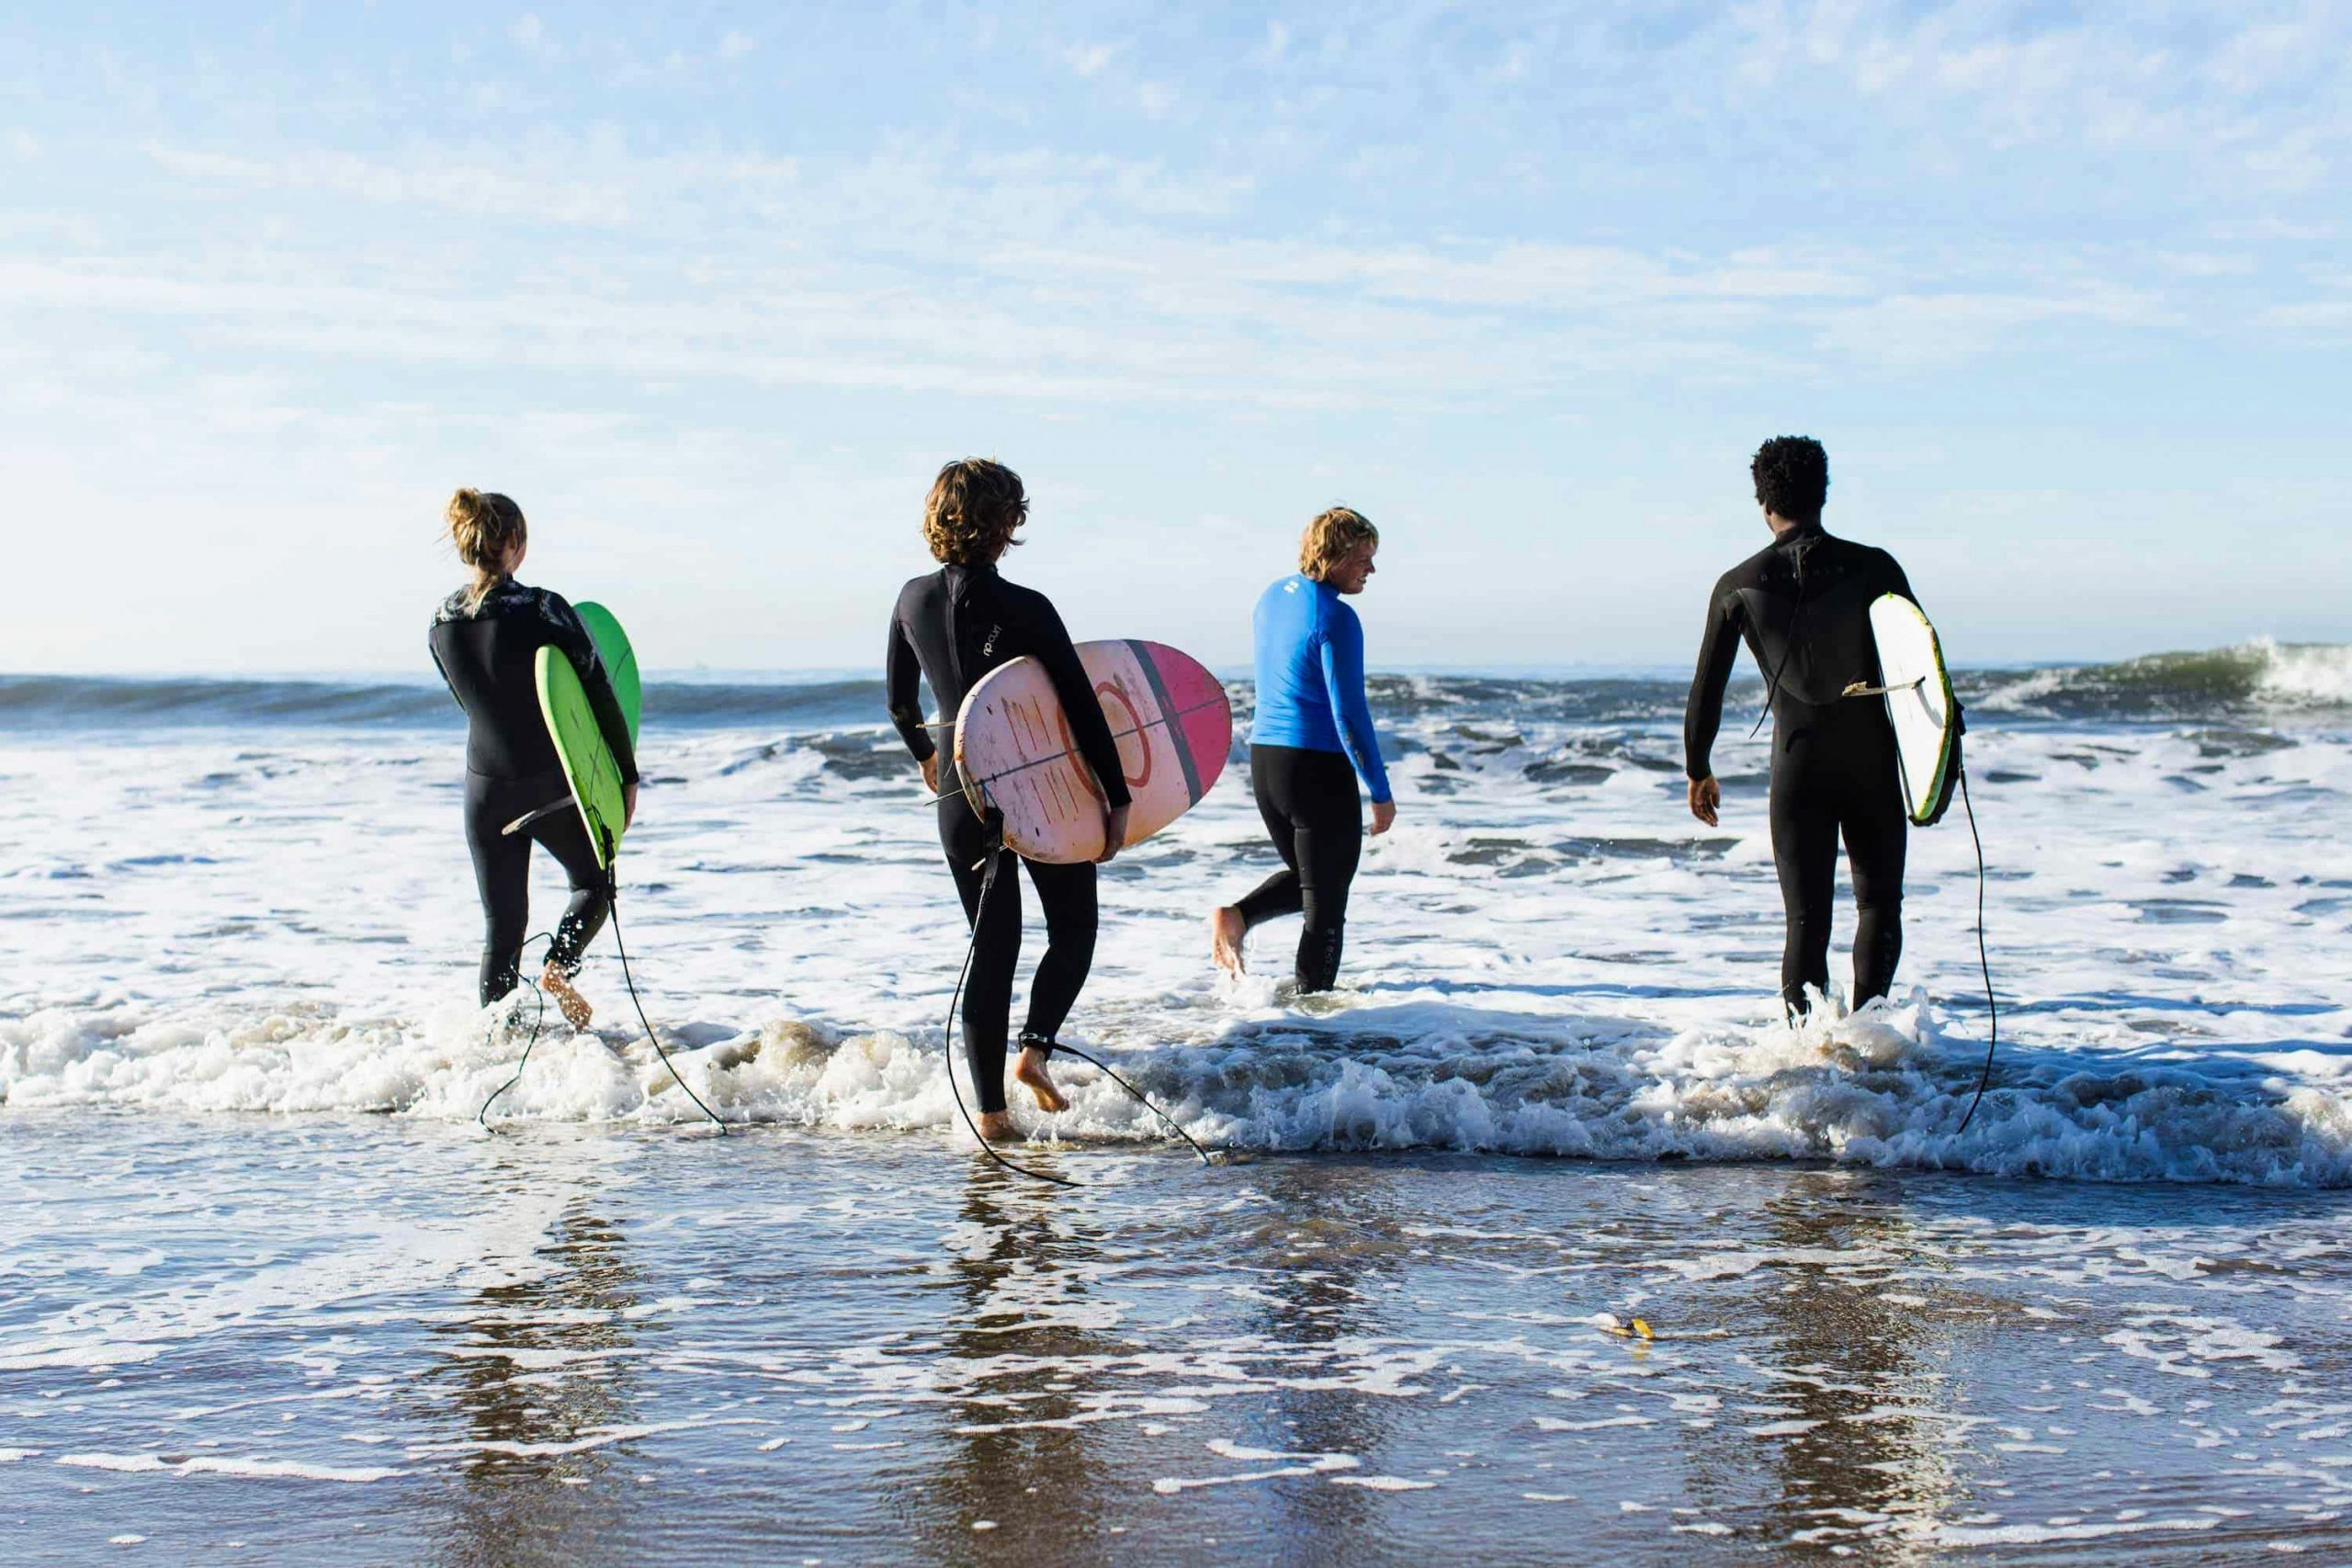 Surfing in Santa Barbara image